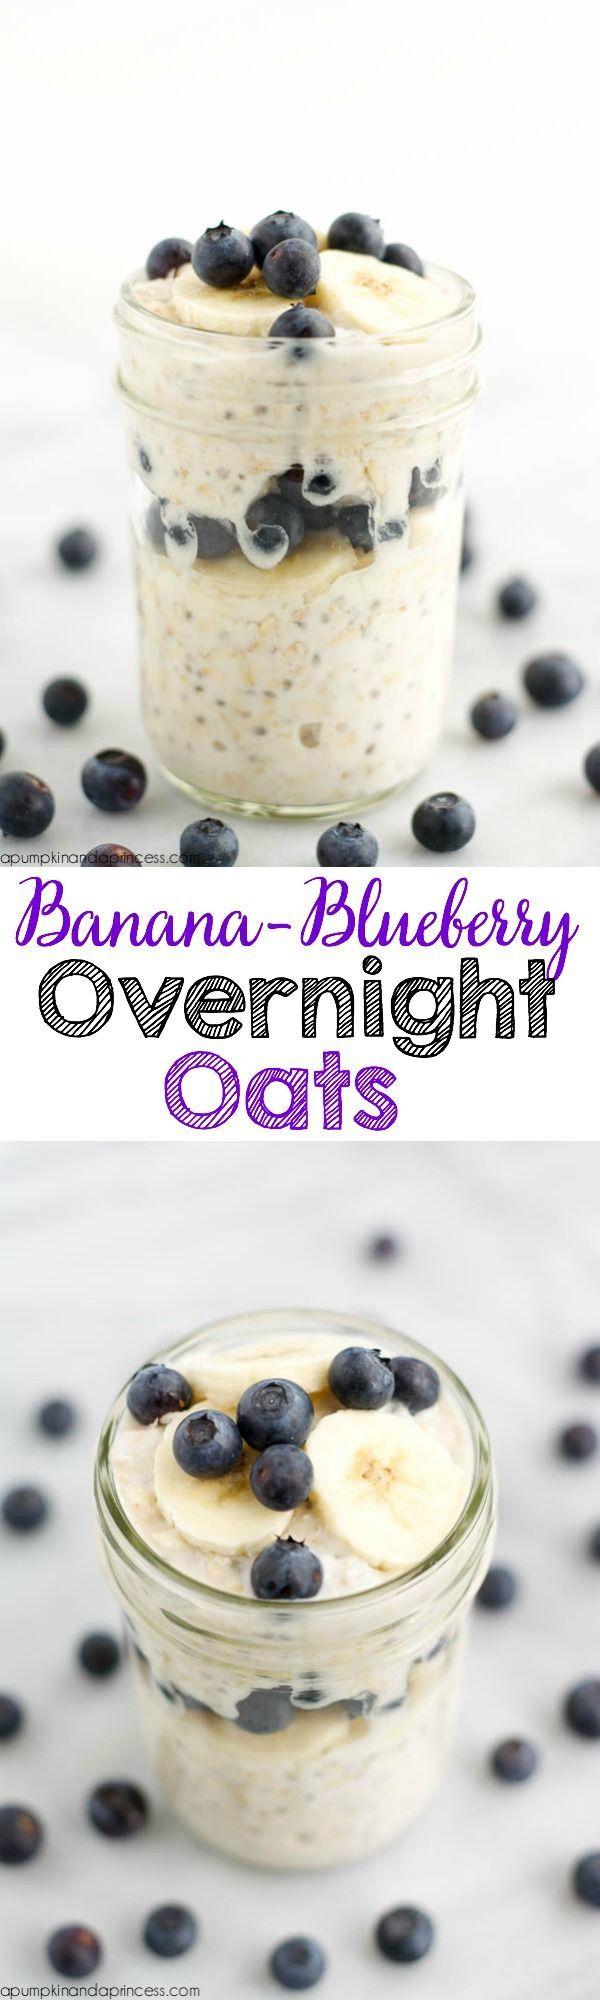 Banana-Blueberry Overnight Oats